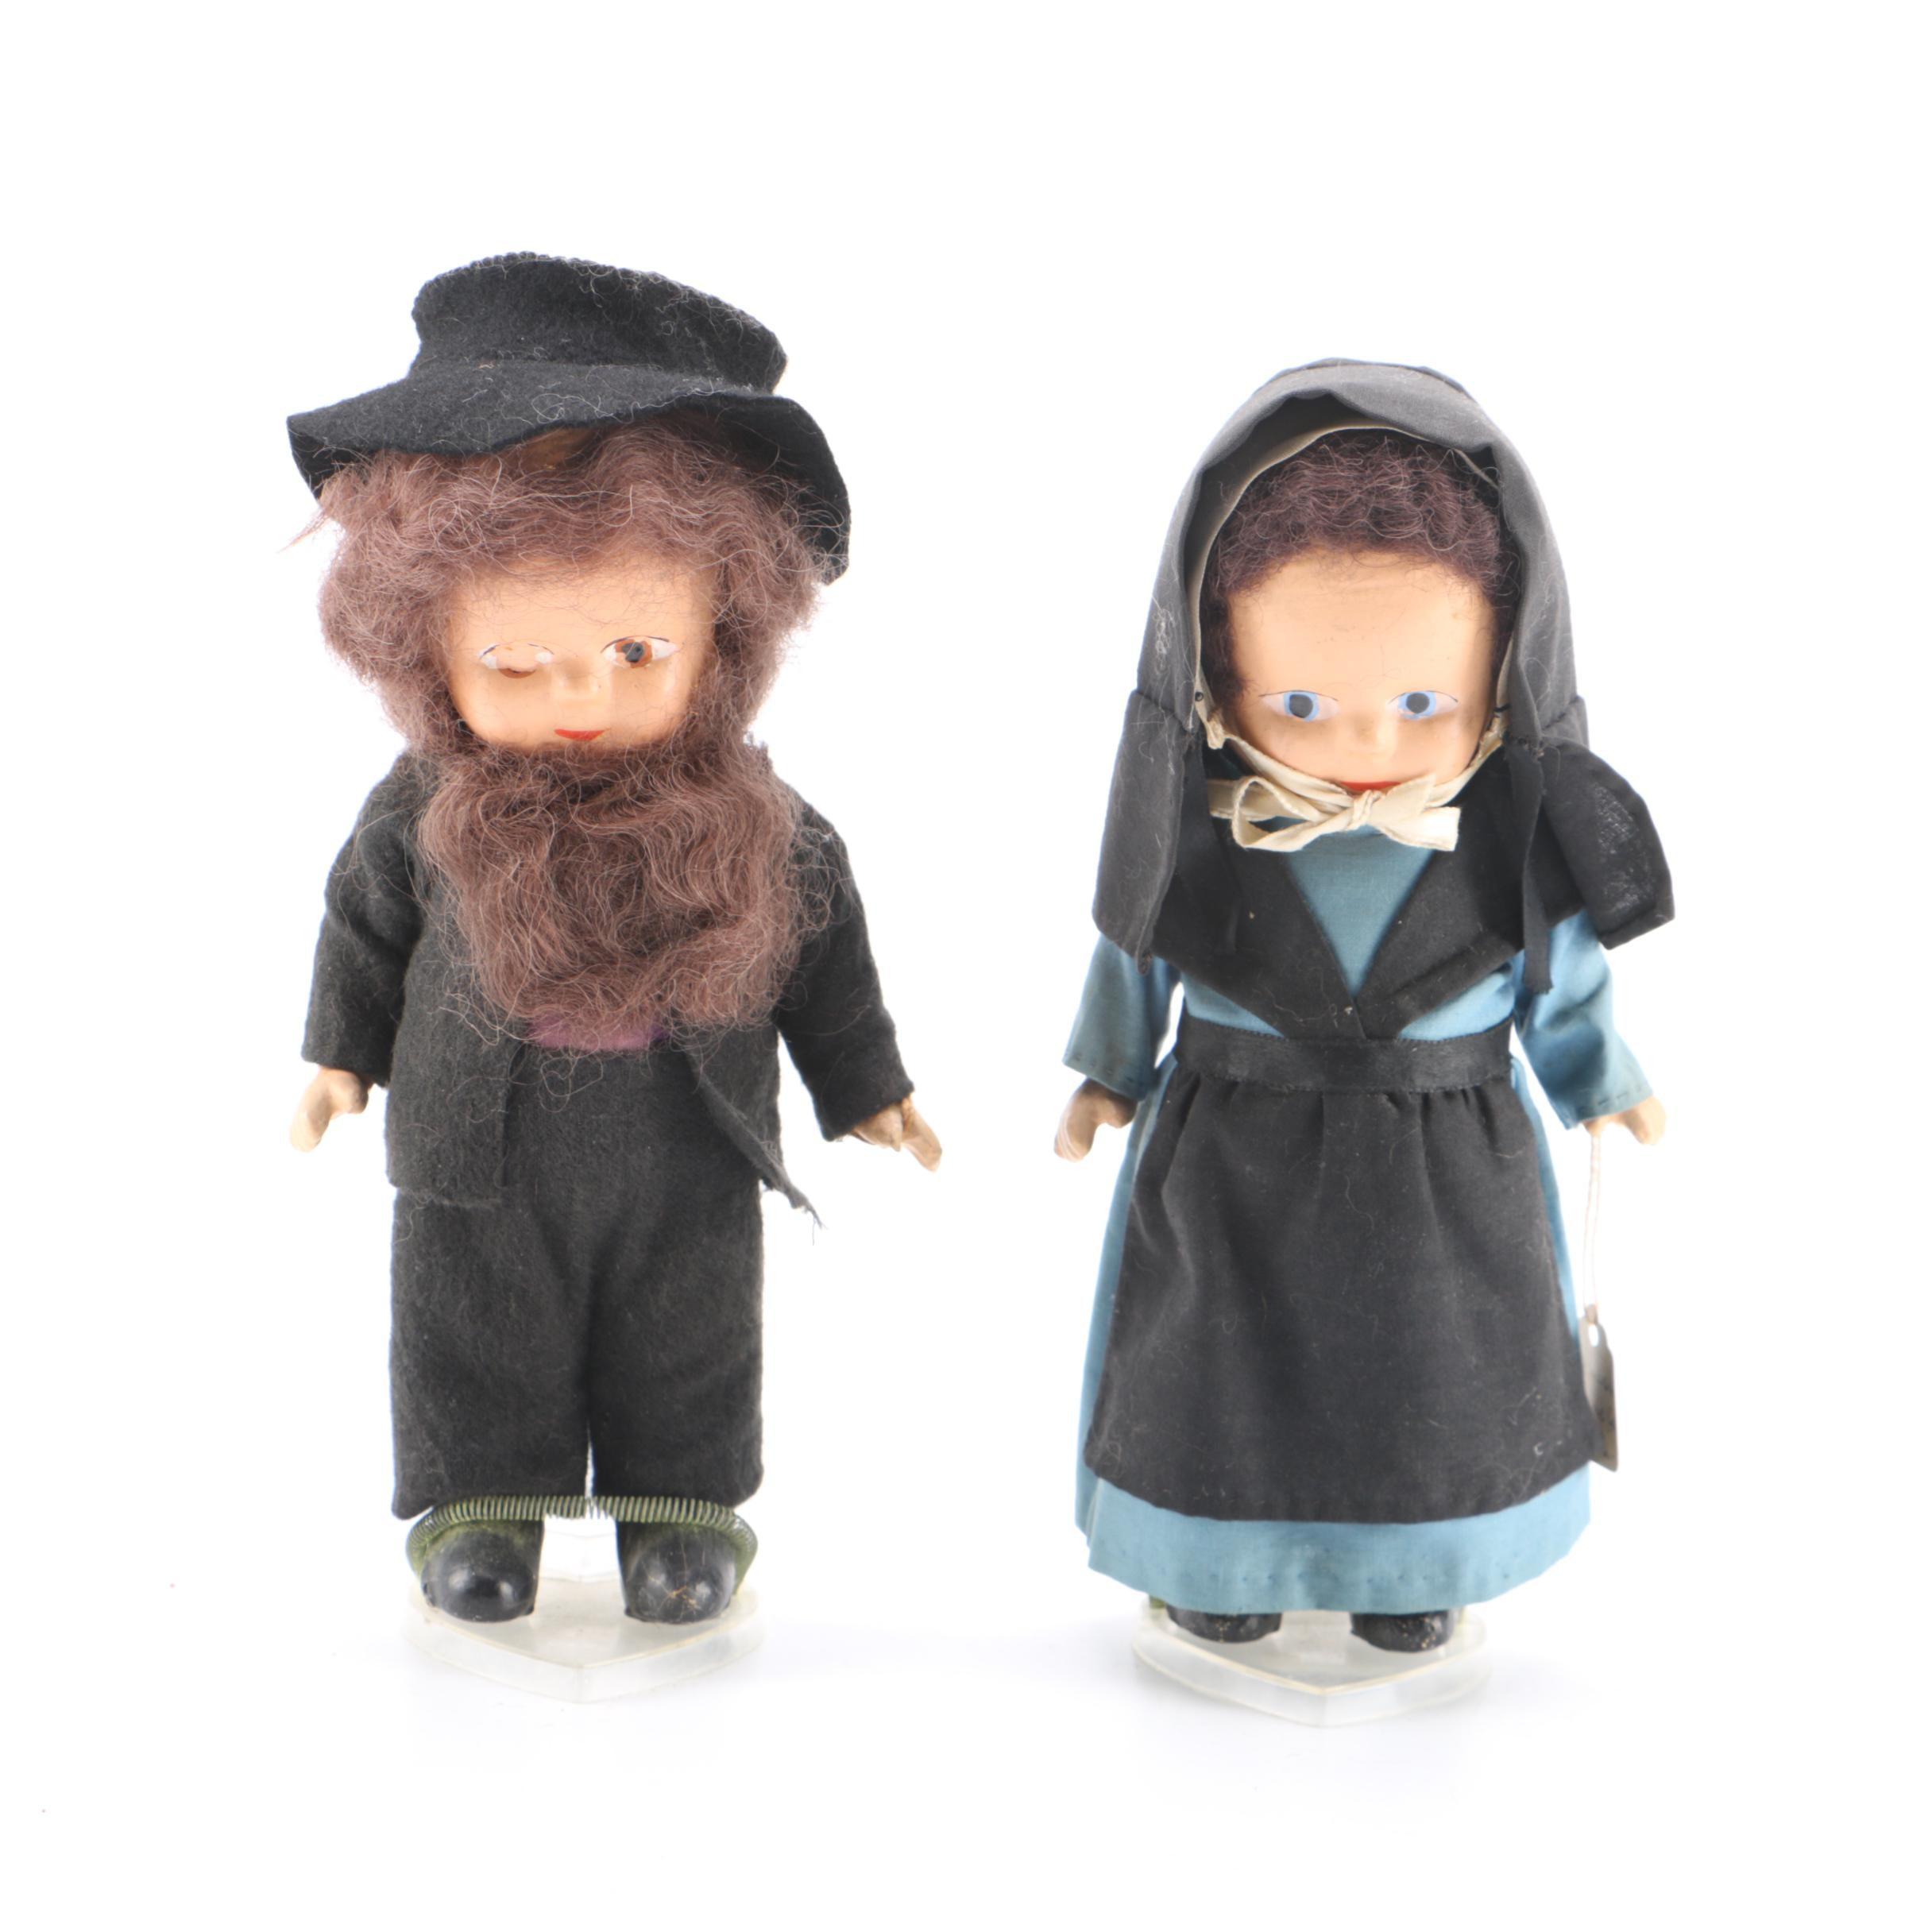 Lancaster County Way Amish Dolls